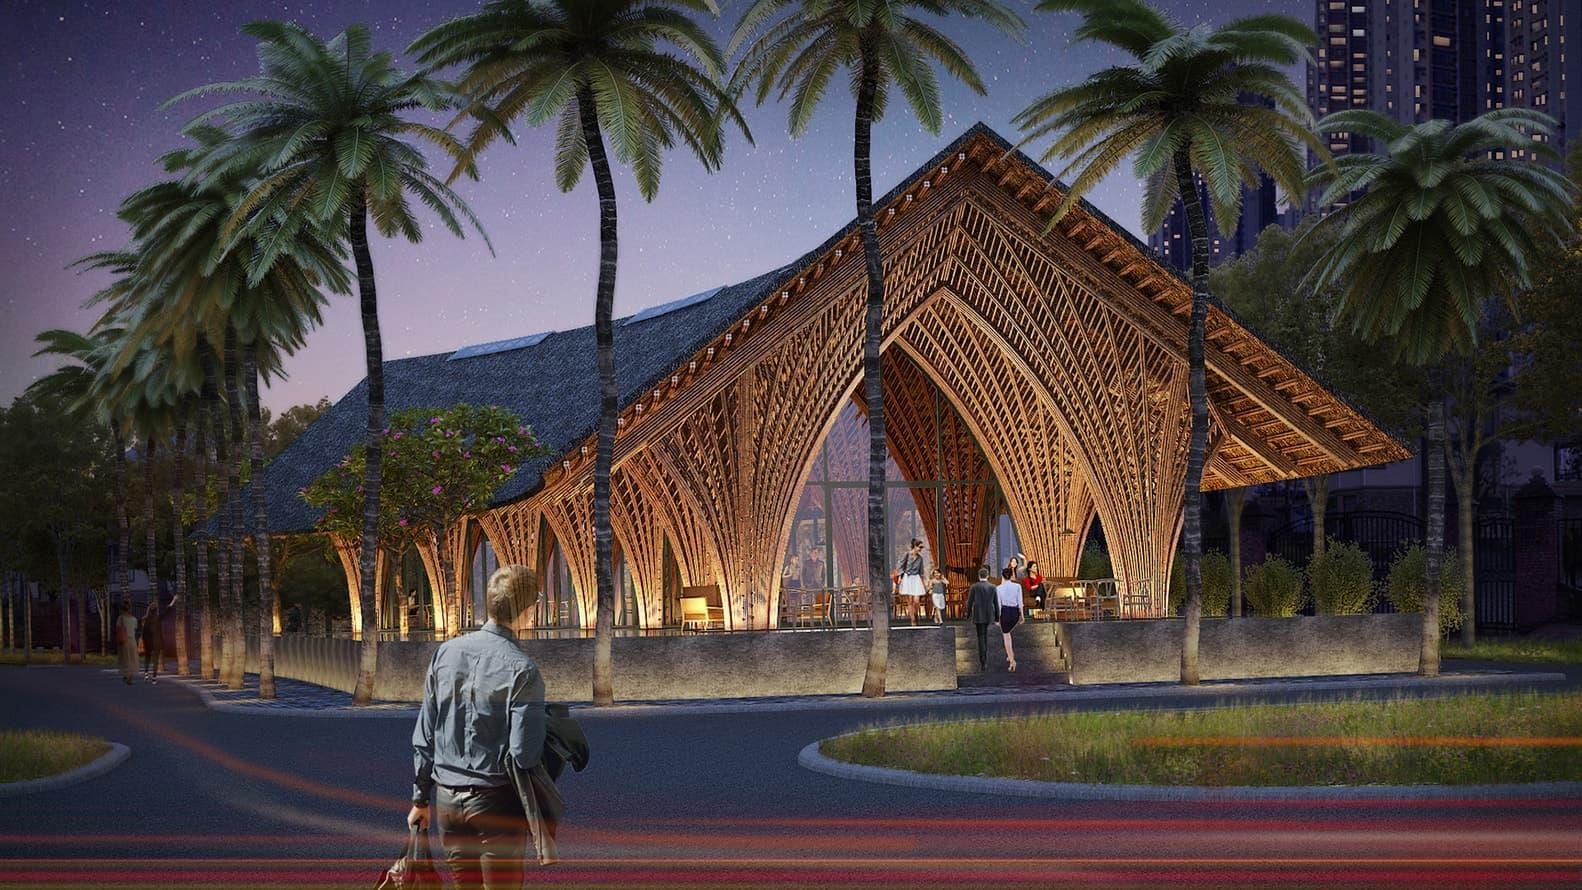 Ting Xi Bamboo Pavilion, China